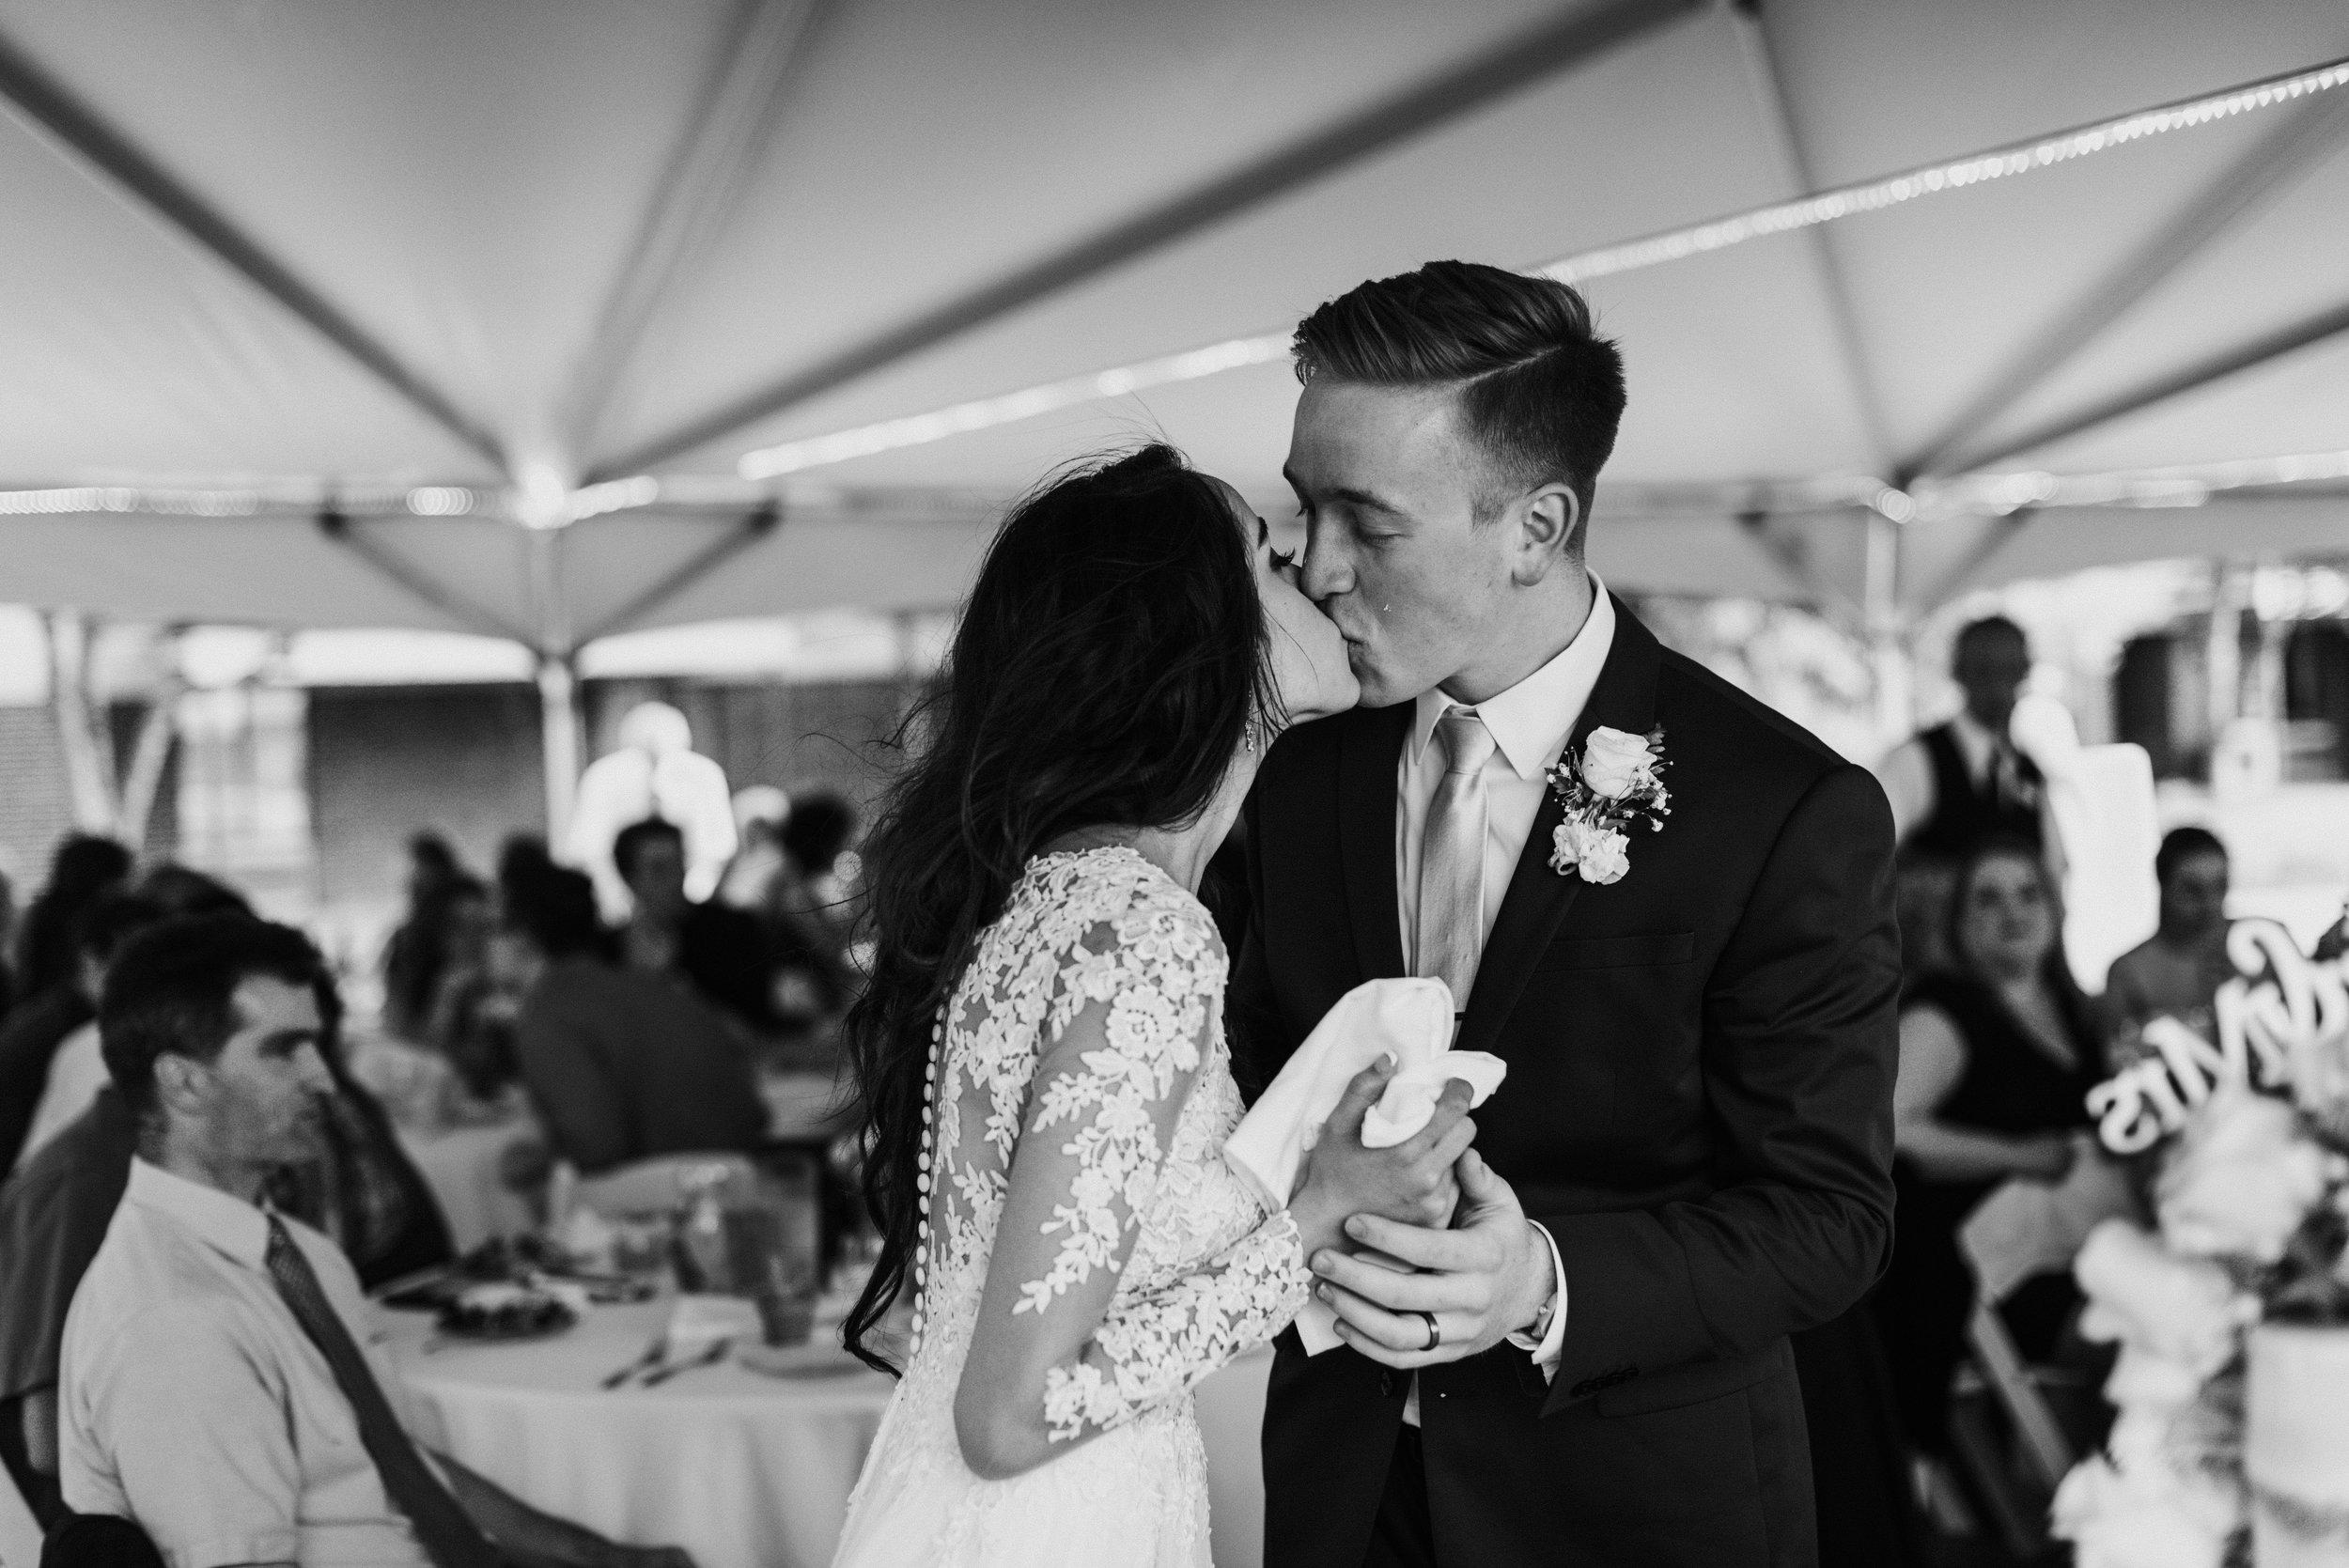 Barch-Massachusetts-Lakeside Tent Wedding-Western Massachusetts Wedding Photographer-02611.jpg